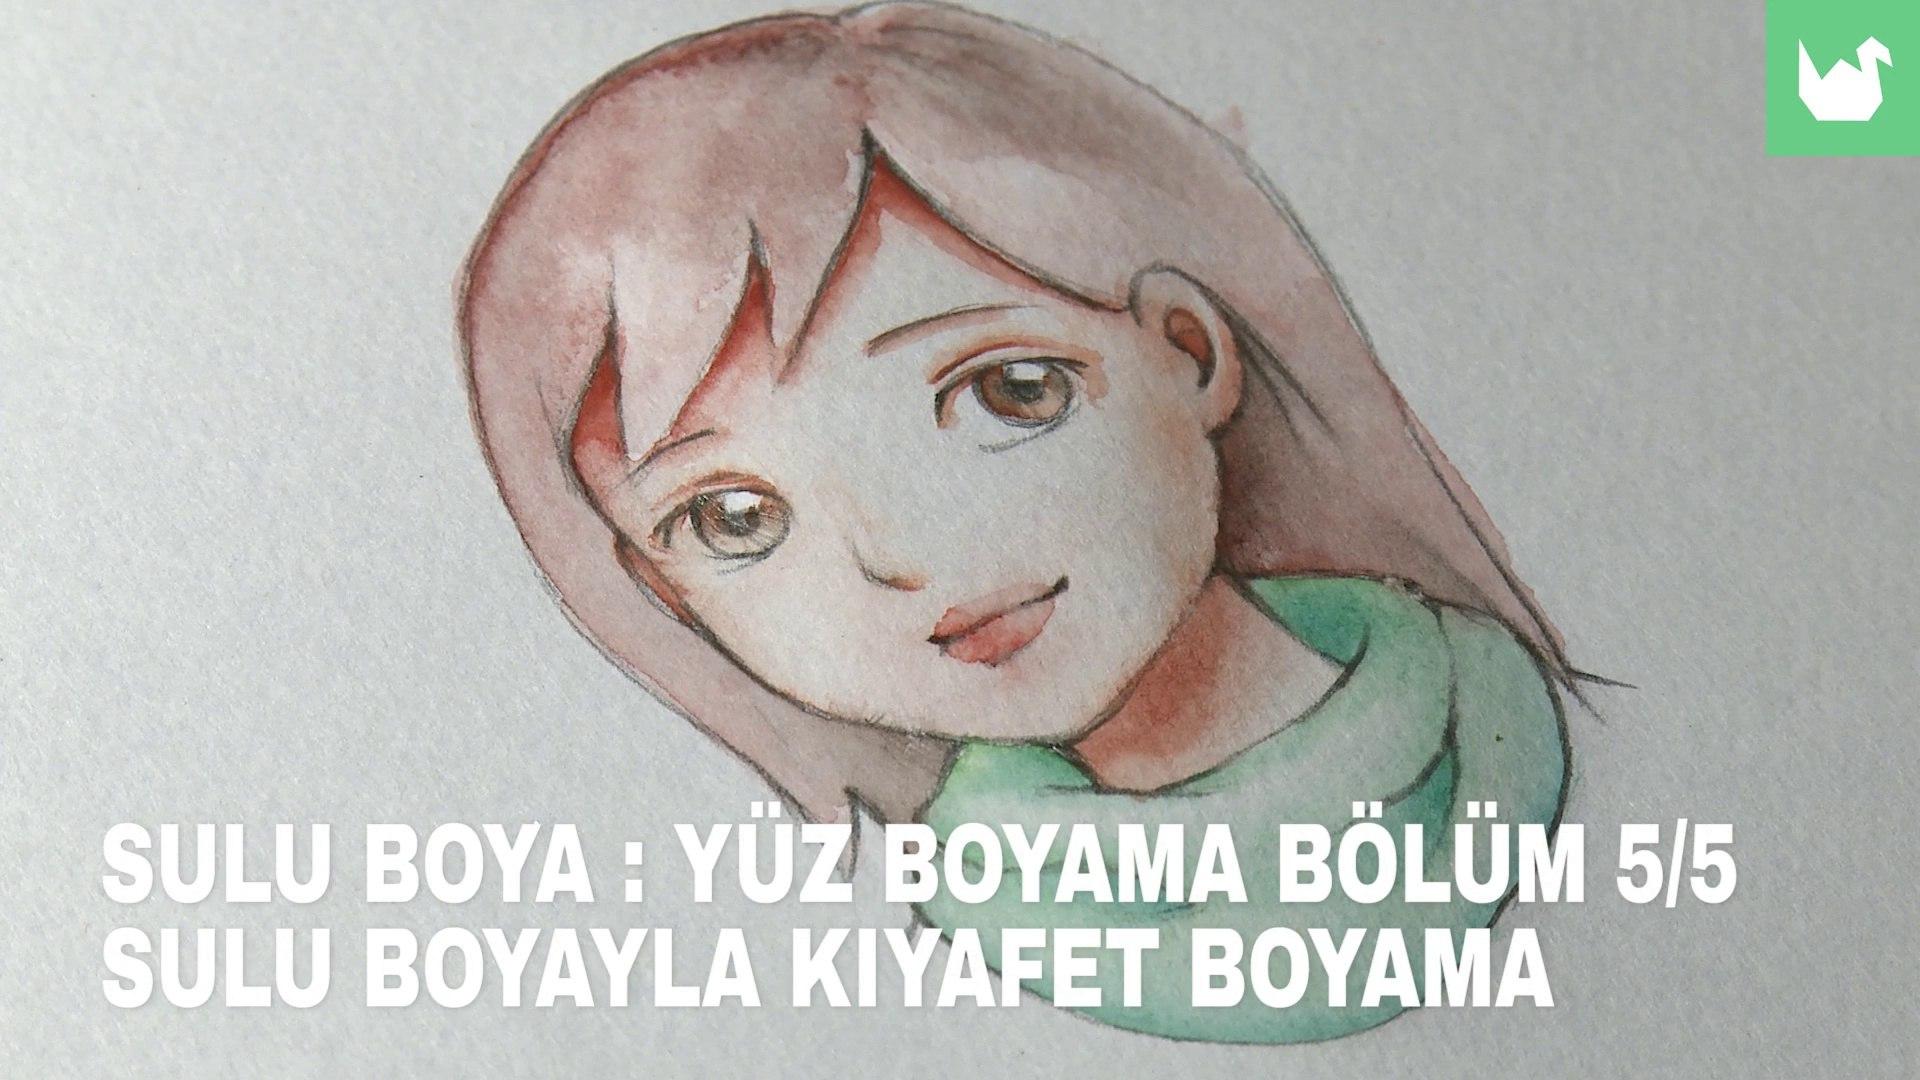 Sulu Boya Yuz Boyama 5 5 Kiyafet Boyama Video Dailymotion